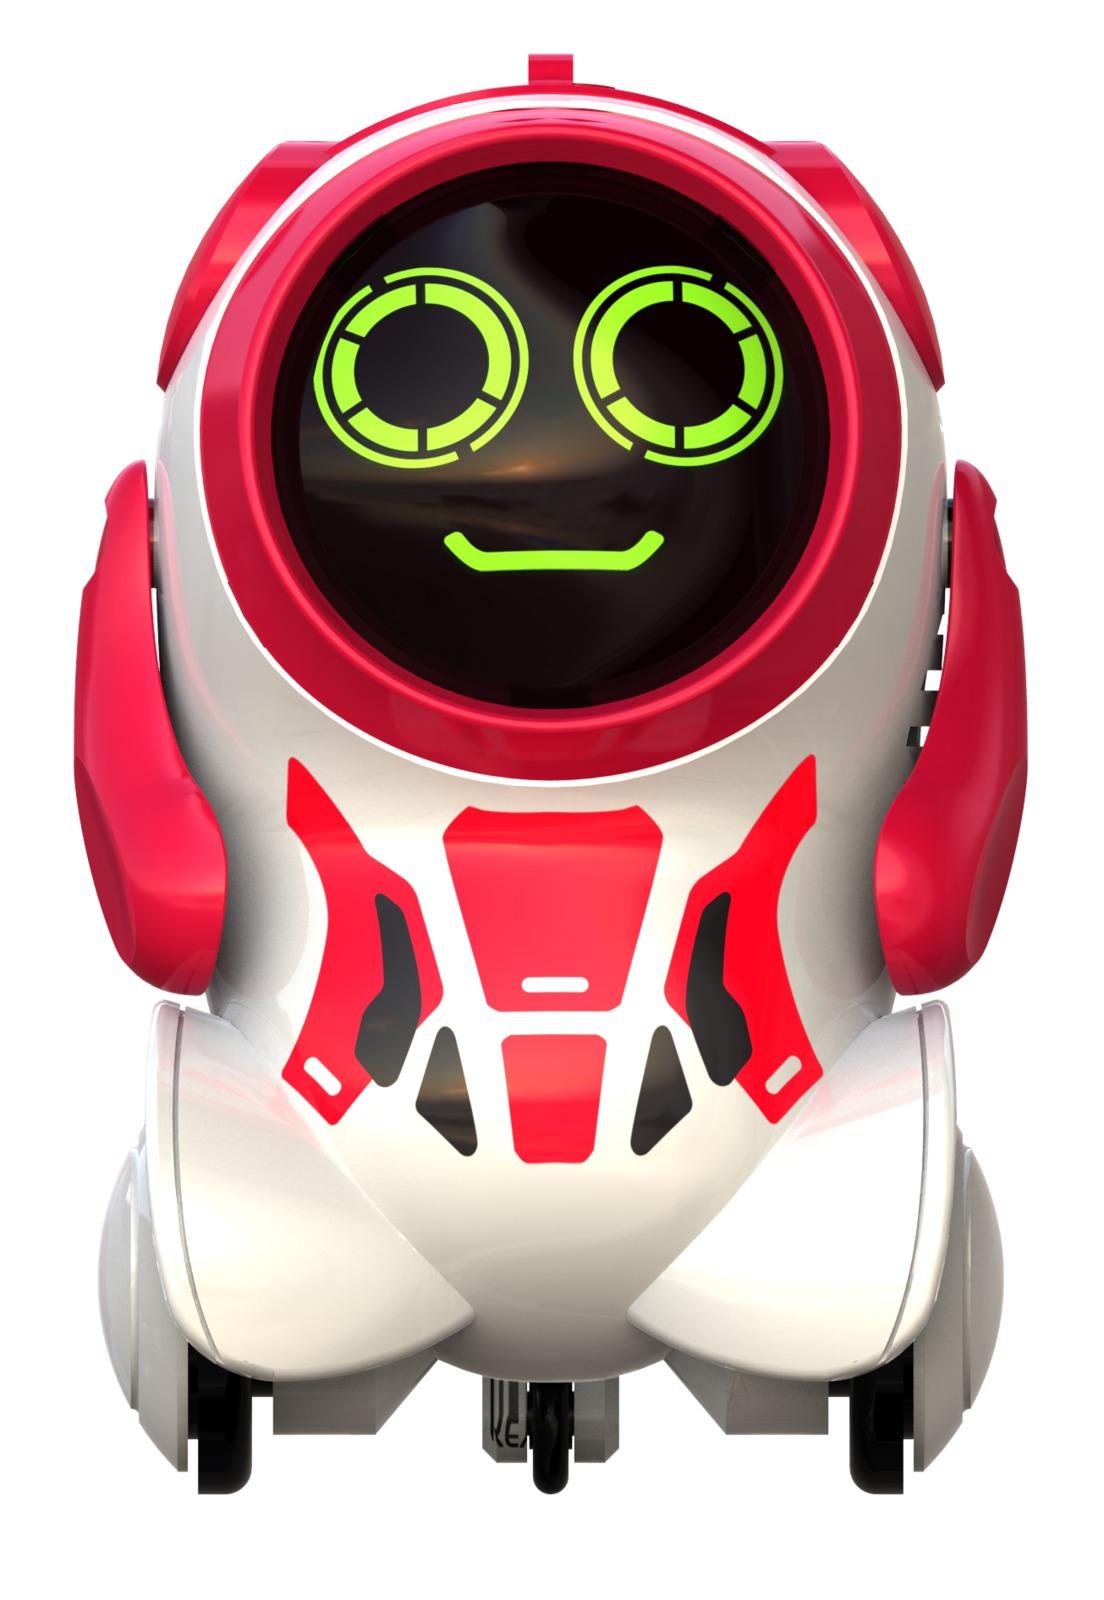 Silverlit: Pokibot Round - Red image